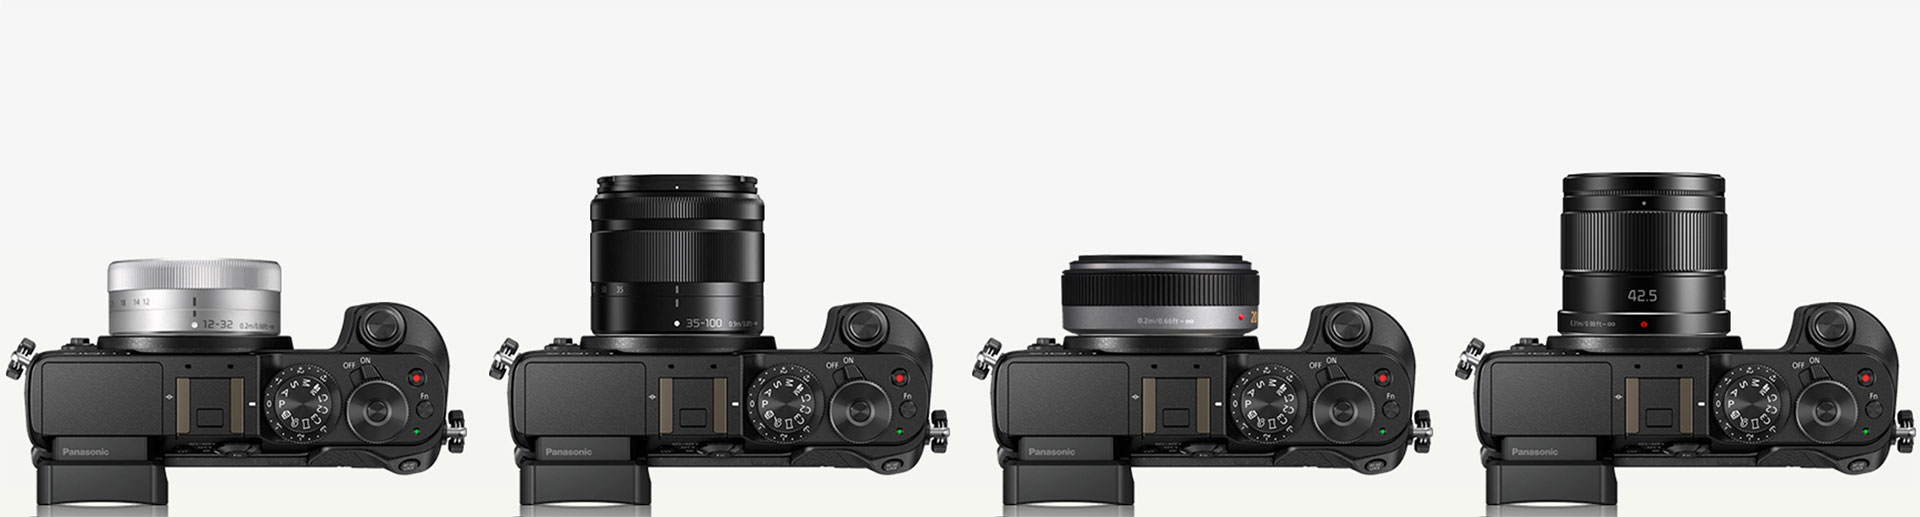 Jual Panasonic Lumix Dmc Gx85 Kit 12 32mm Silver Kamera Mirrorless Black Hitam Panasoniclumixvideo Gx9 Shooting Impression By Viviana